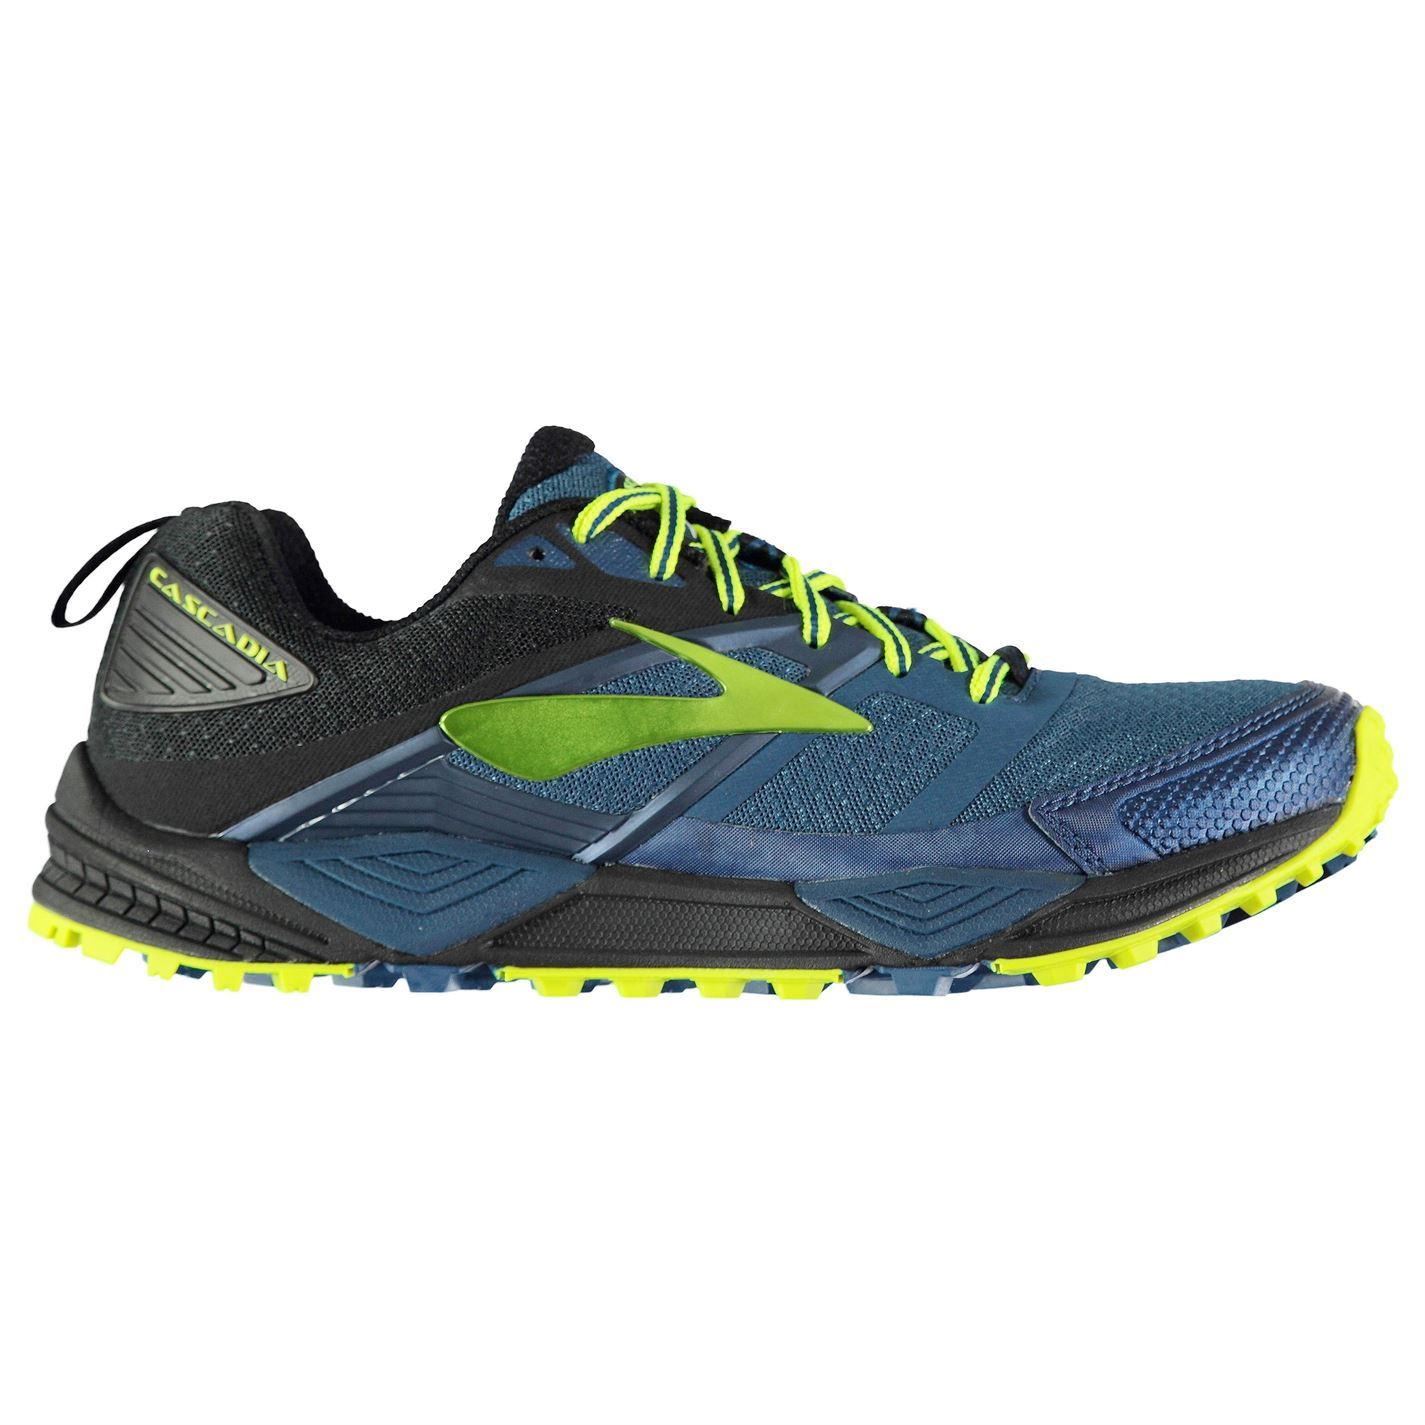 Brooks Cascadia 12 Trail Running Schuhes  Gents Herren Gents  b42055